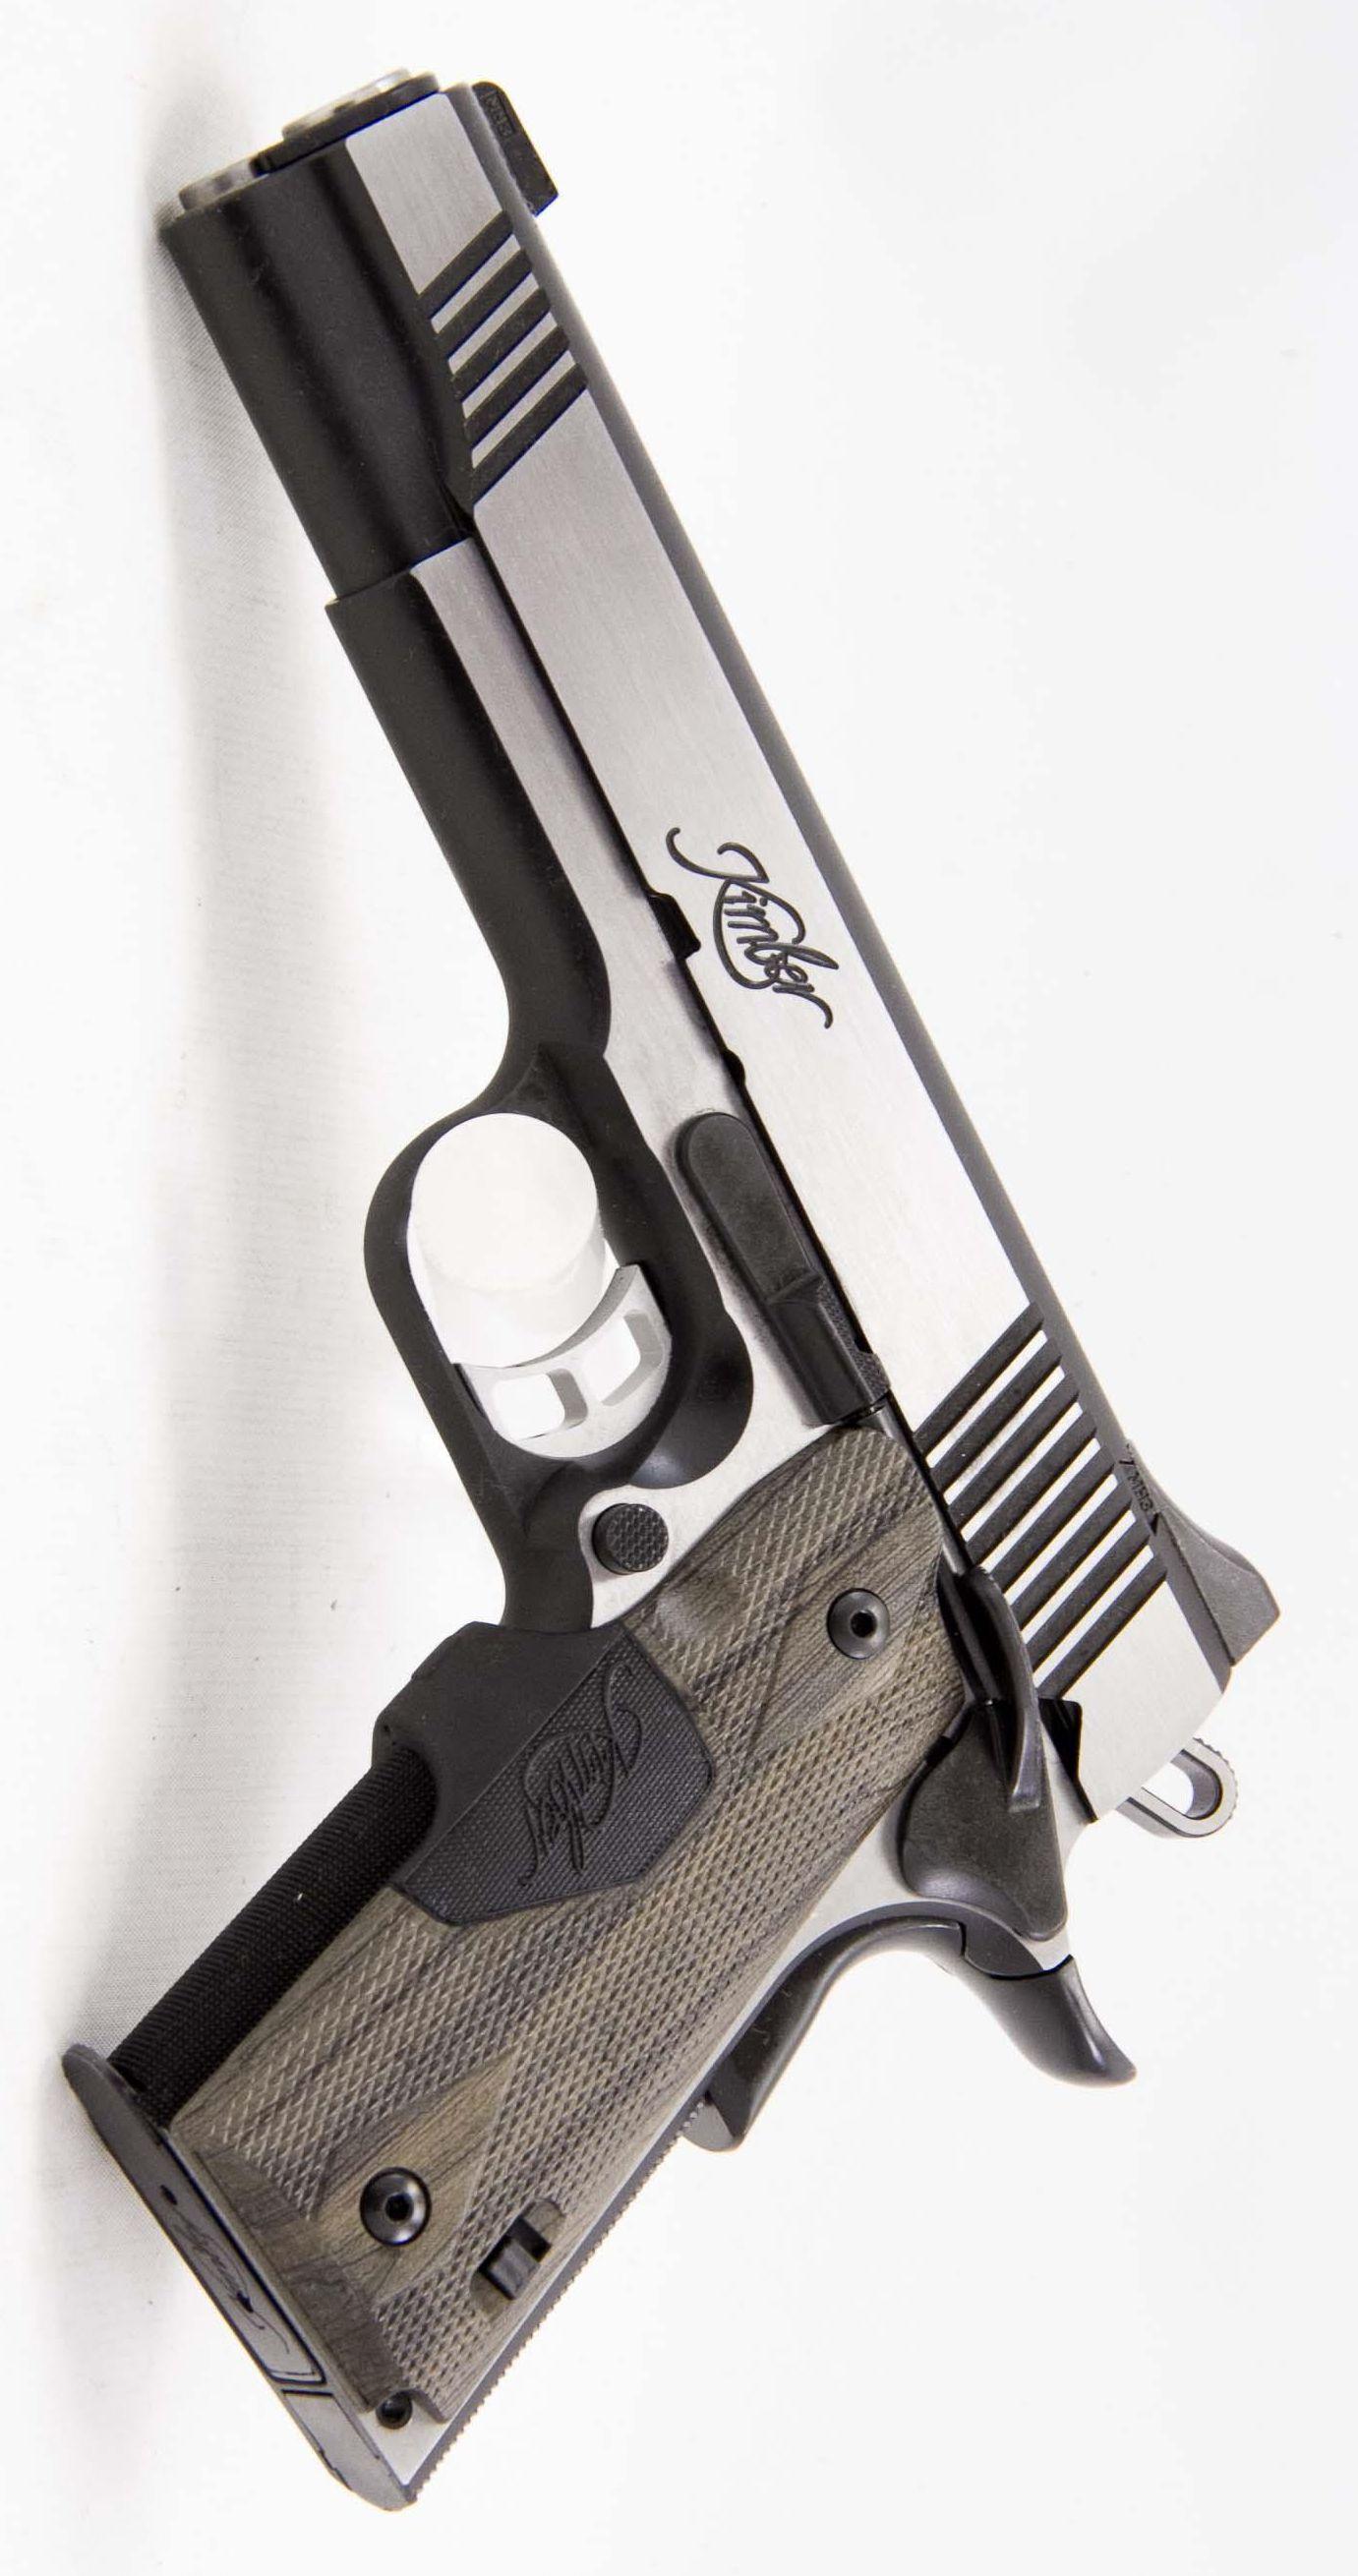 kimber mfg 1911 eclipse custom ii lg 45 acp handgun pistol 5in 45 rh pinterest com